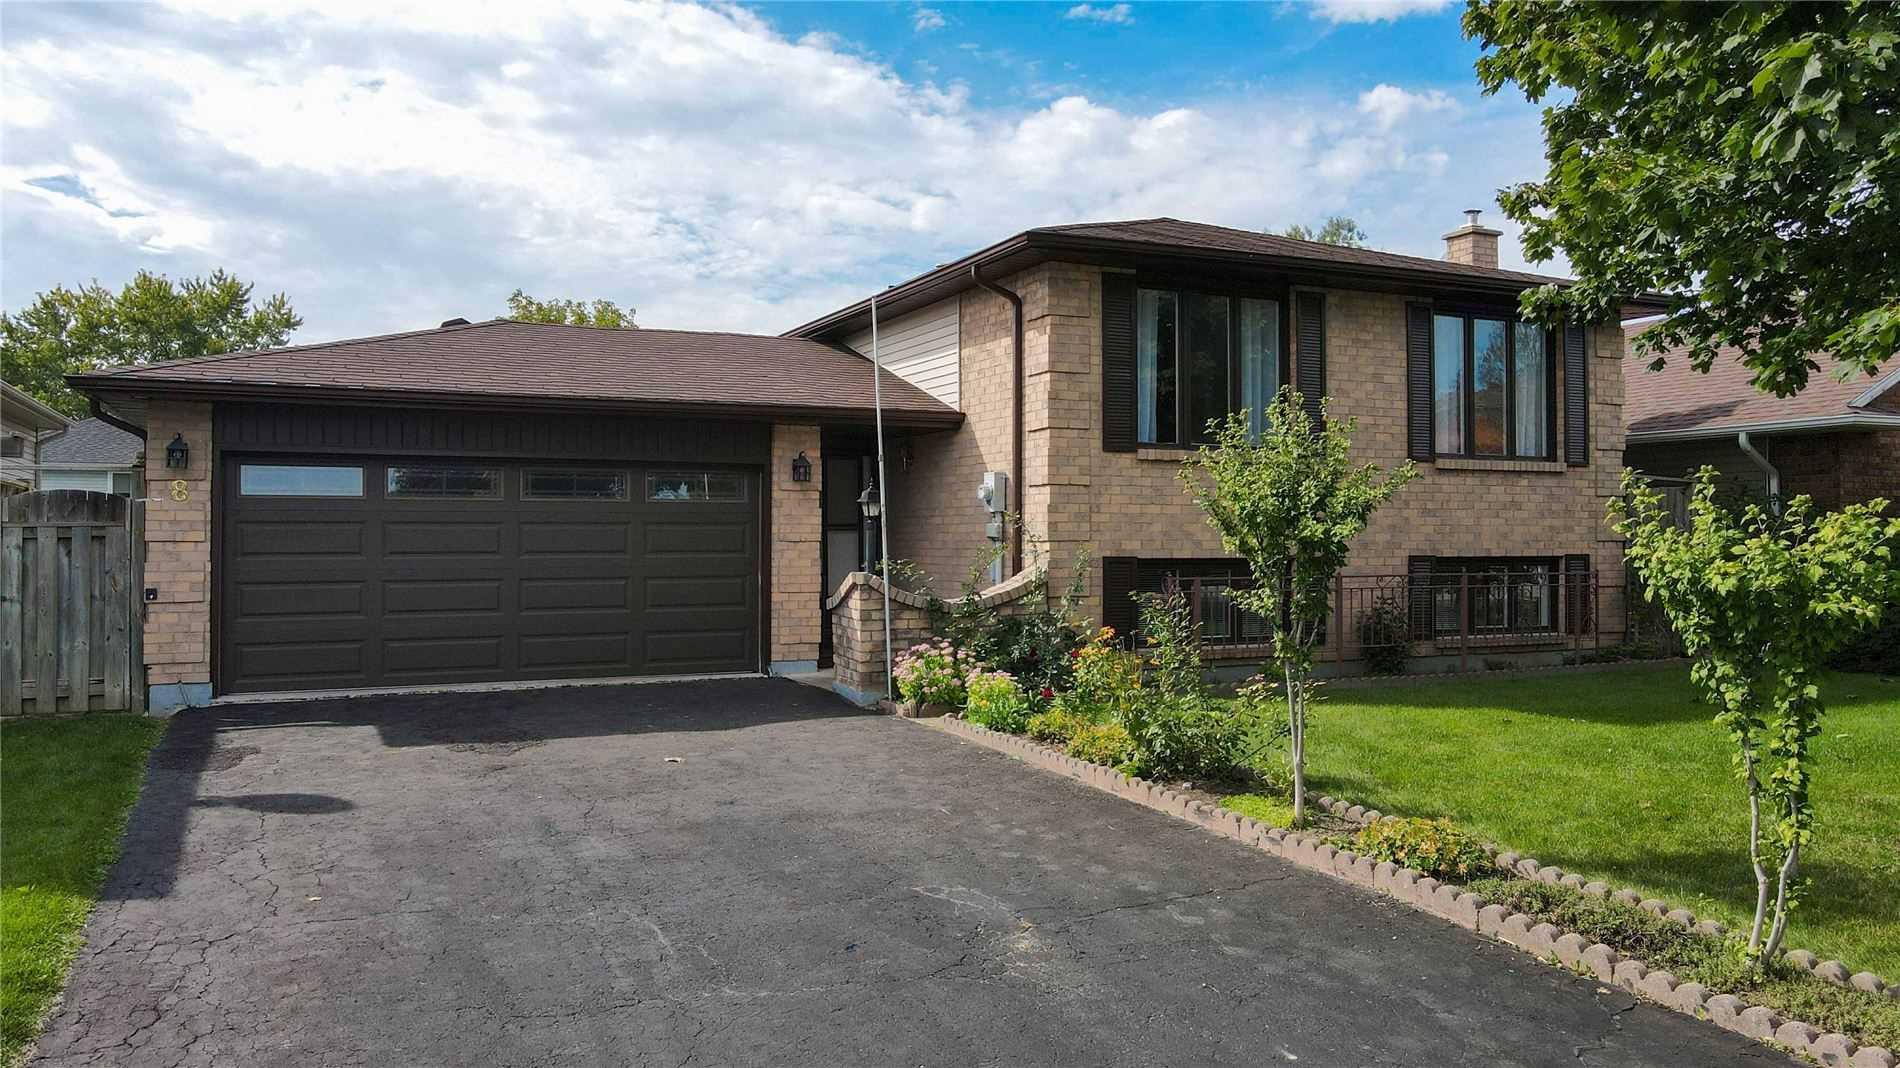 Detached house For Sale In Haldimand - 8 Highland Blvd, Haldimand, Ontario, Canada N3W 1G6 , 3 Bedrooms Bedrooms, ,2 BathroomsBathrooms,Detached,For Sale,Highland